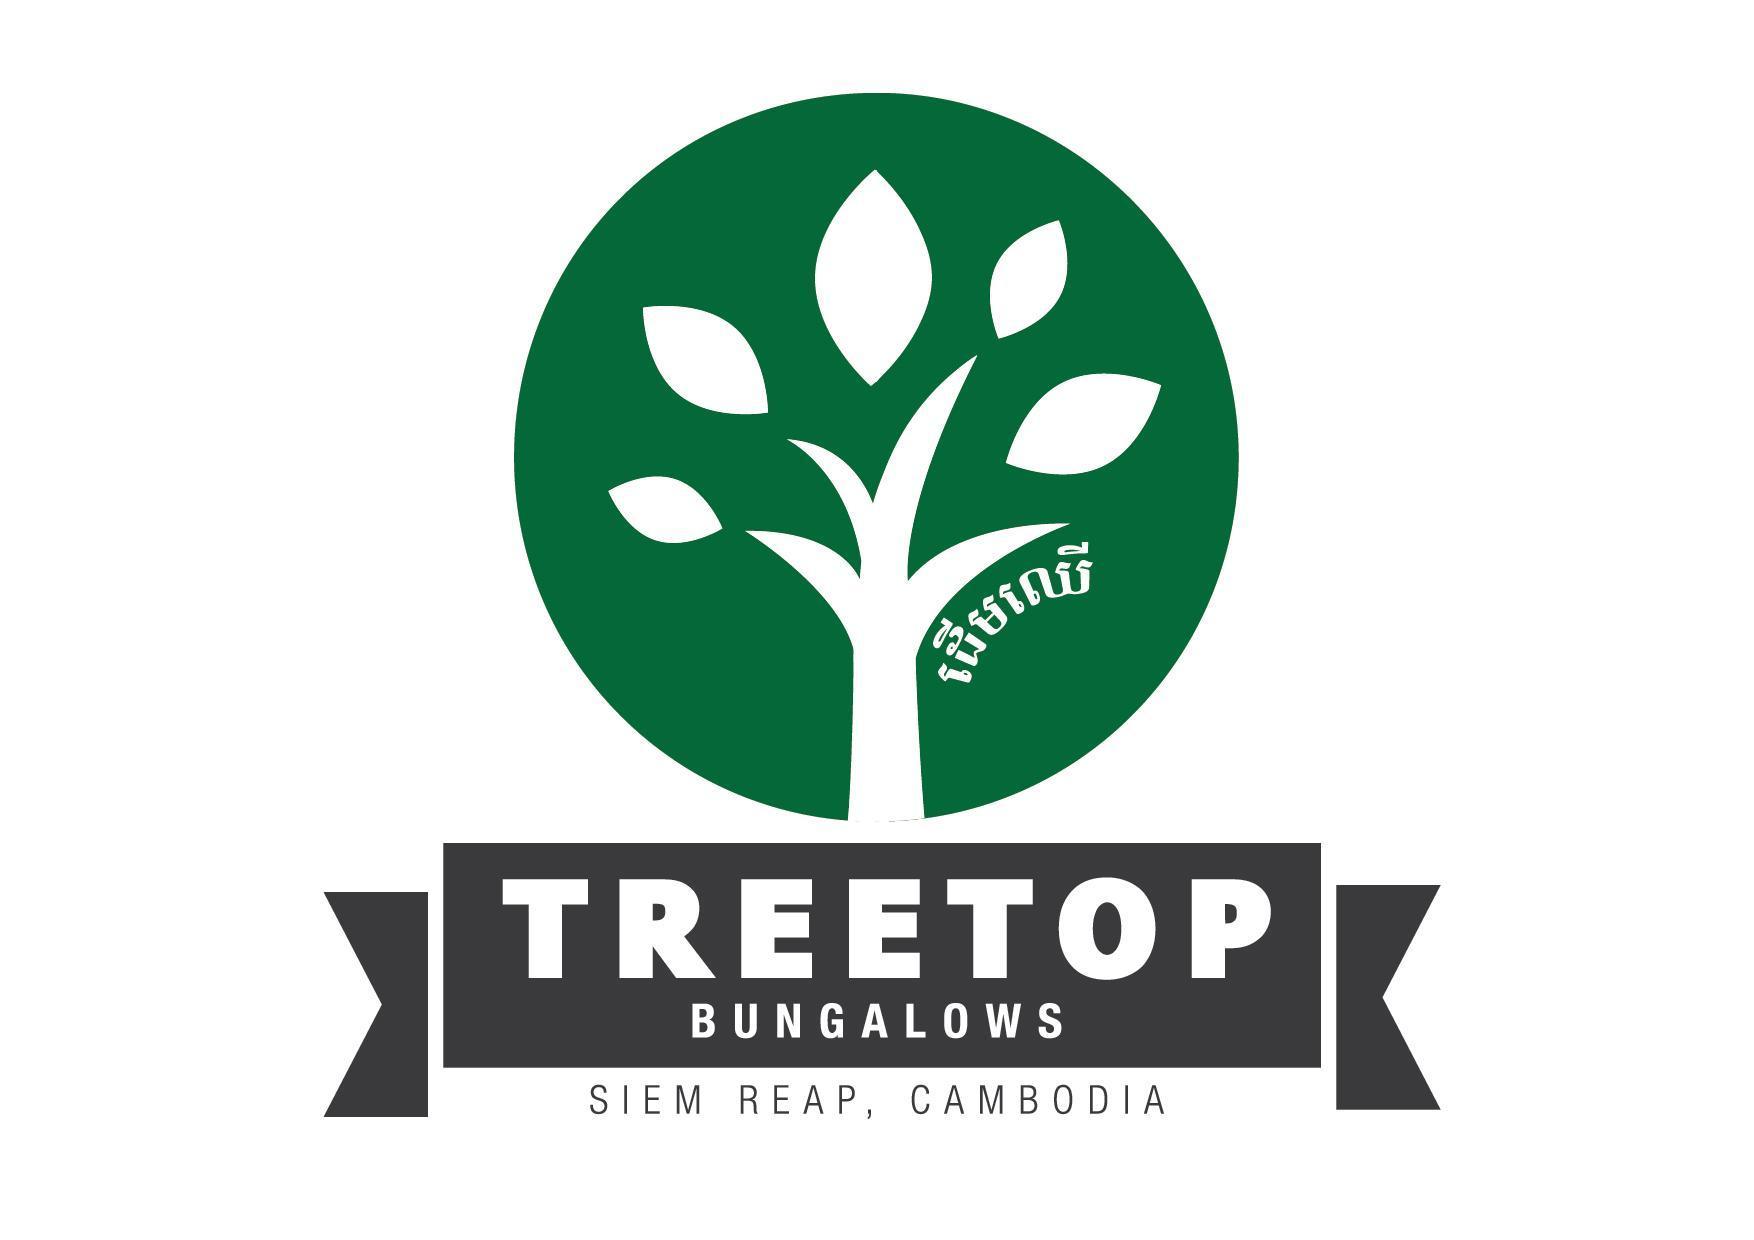 Reviews Treetop Bungalows